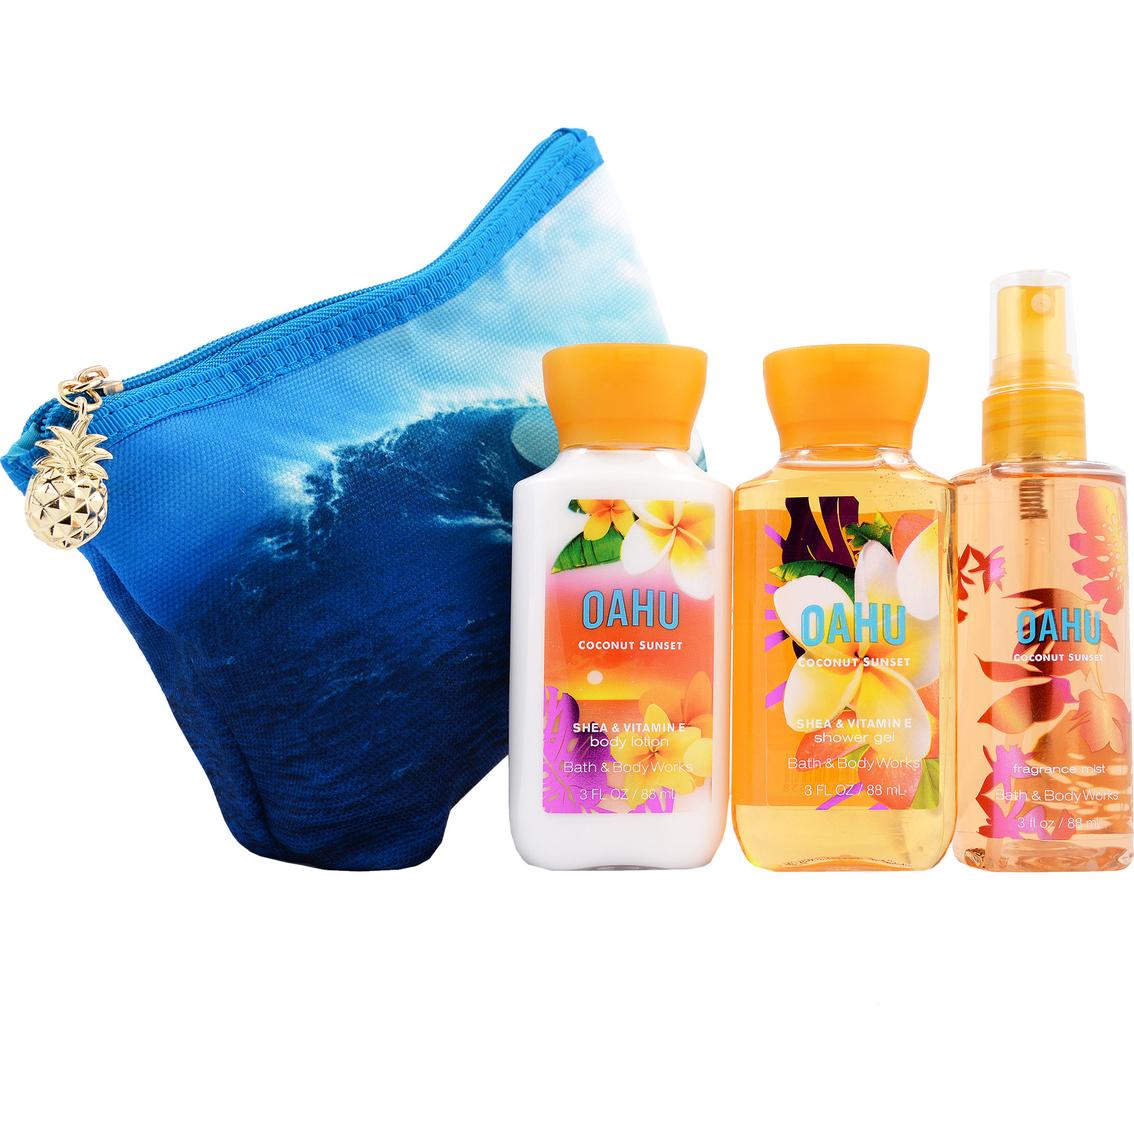 bath body works oahu coconut mini ritual cosmetic bag 1191